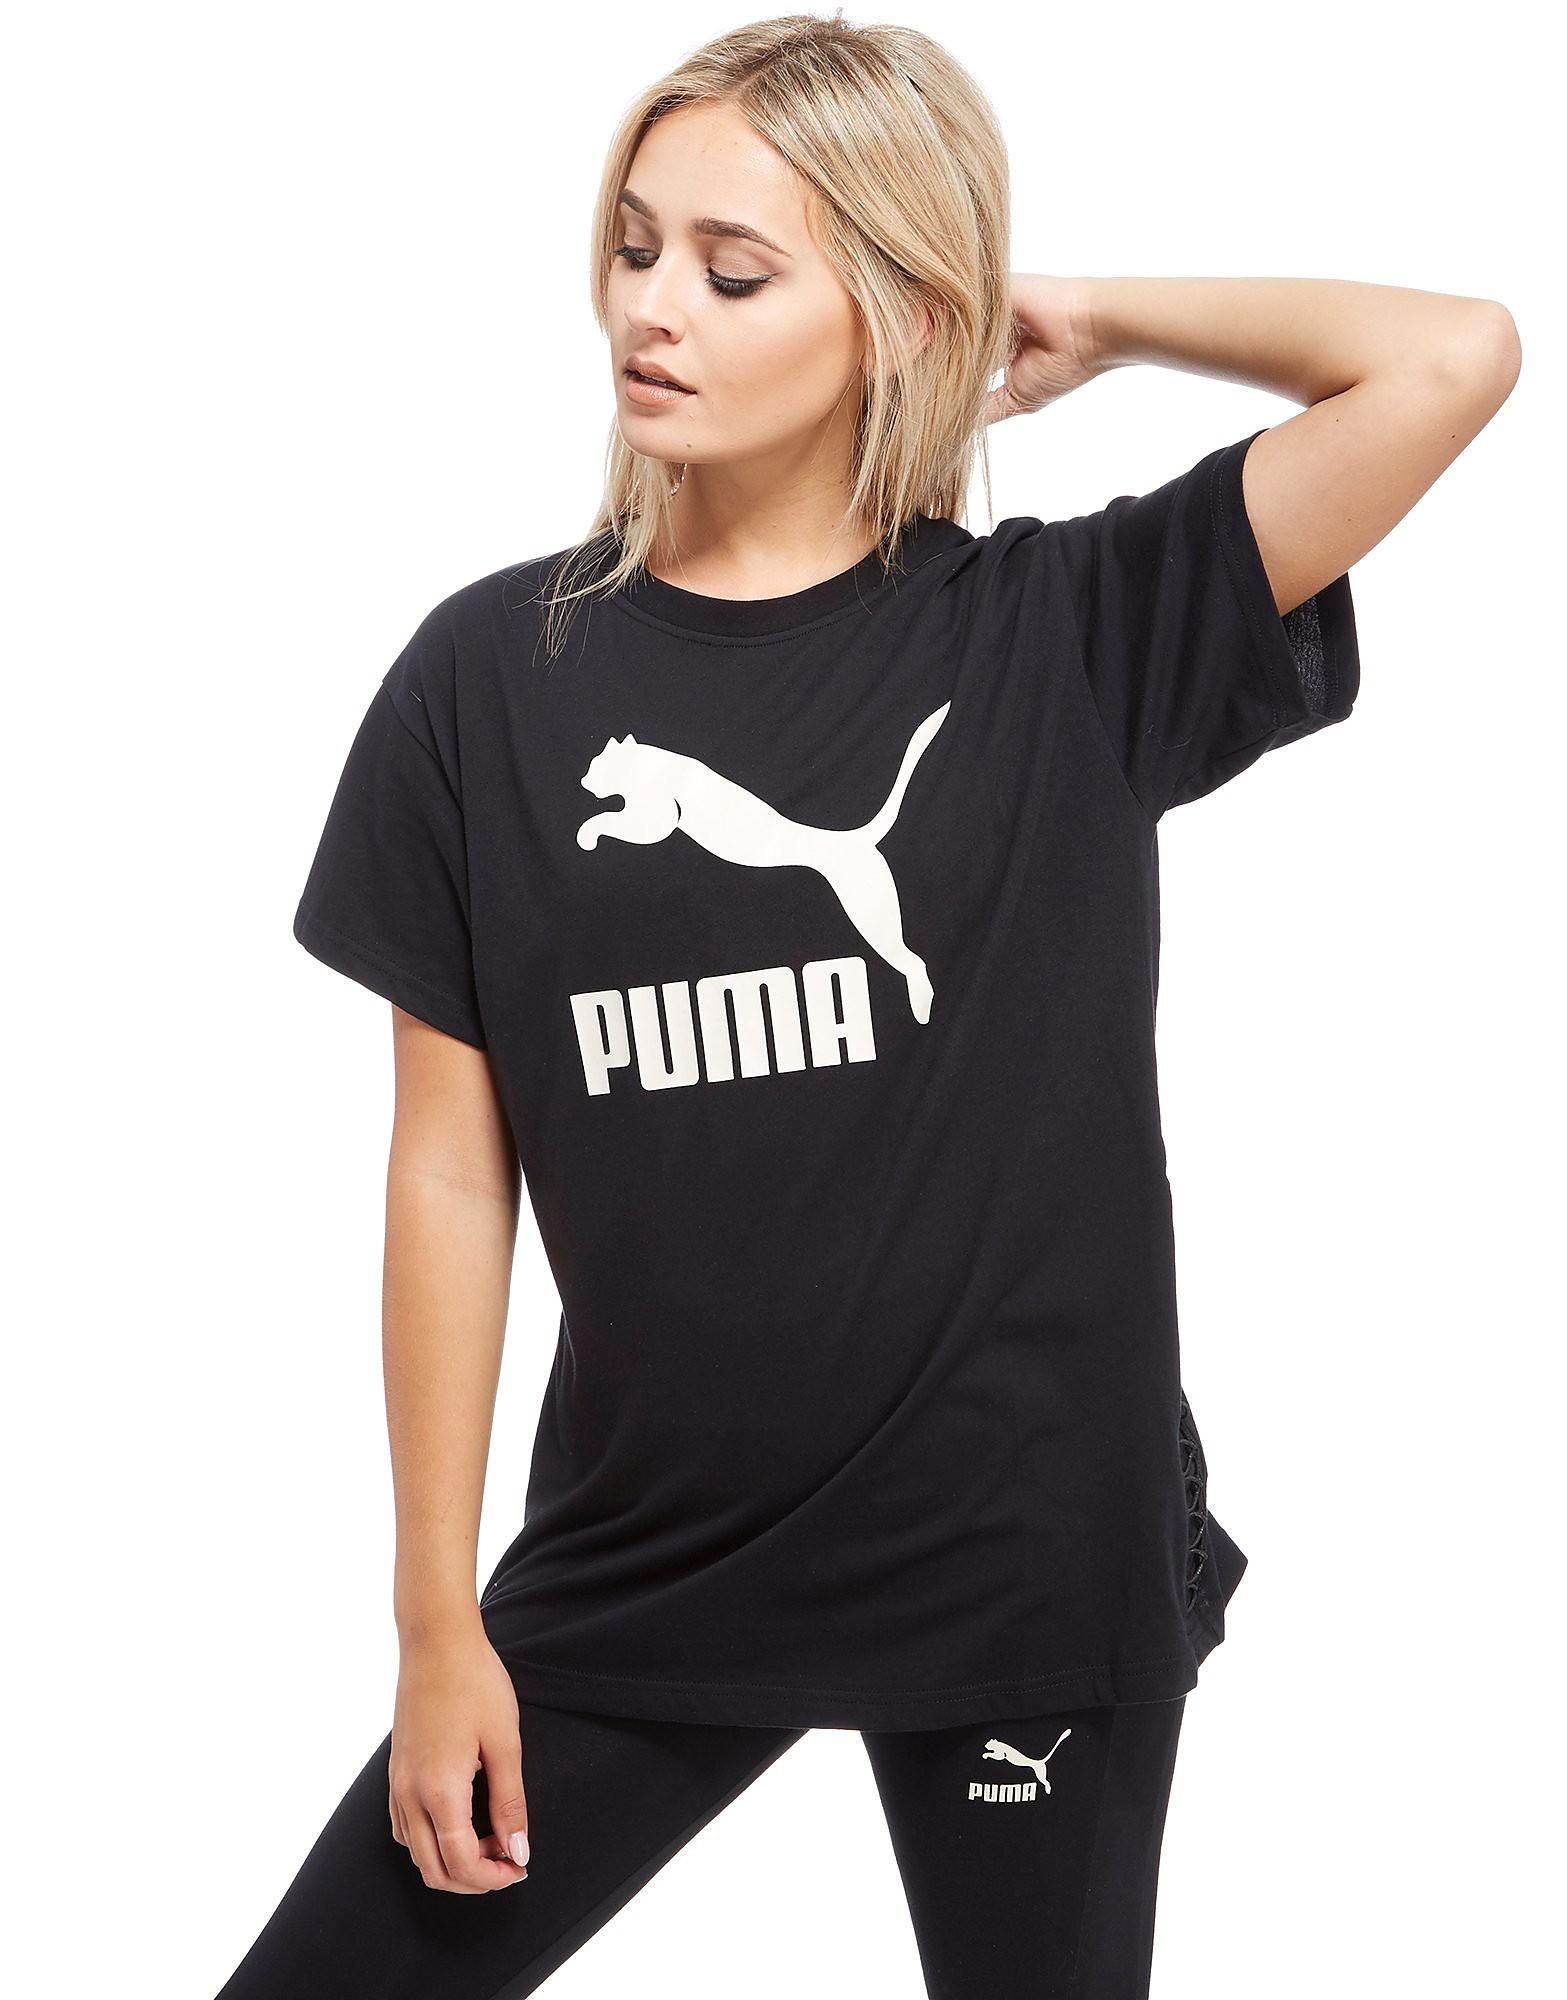 PUMA T-shirt Lace Up Boyfriend Femme